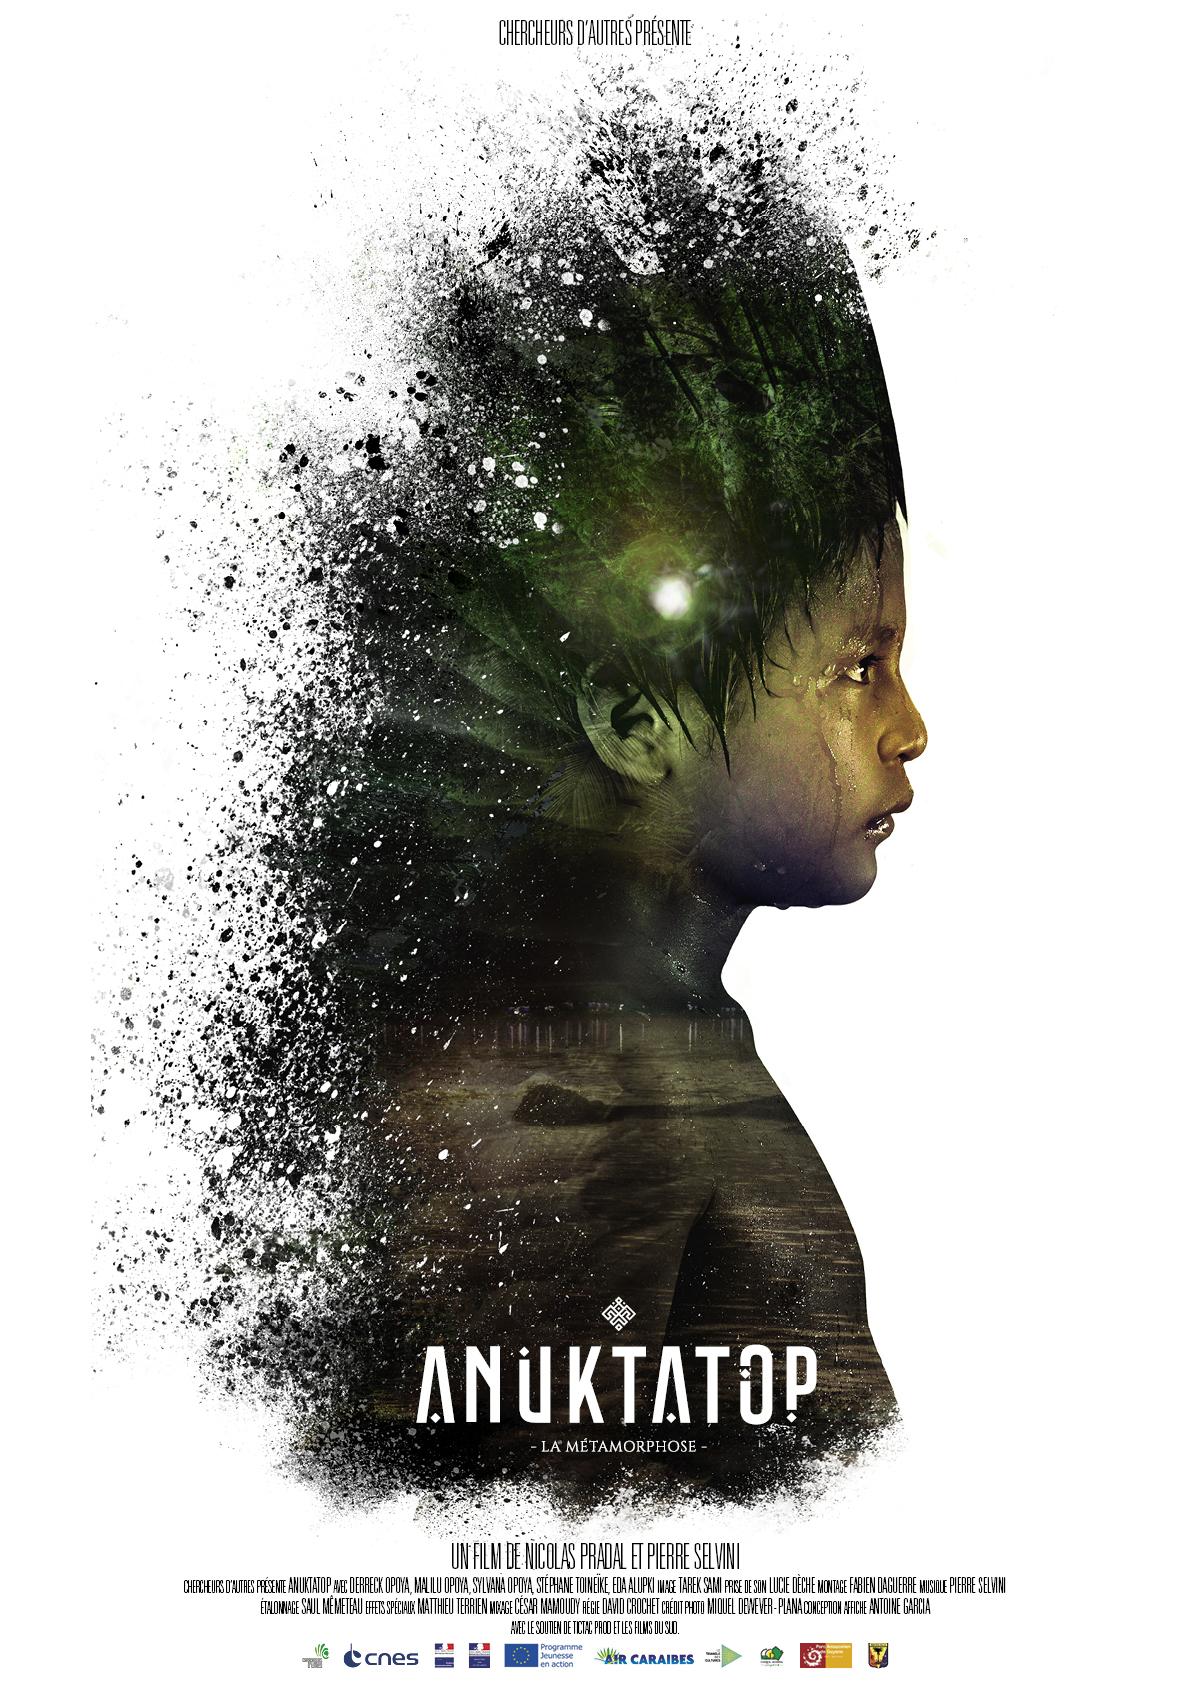 (EN) Long Length Anuktatop: The Metamorphosis